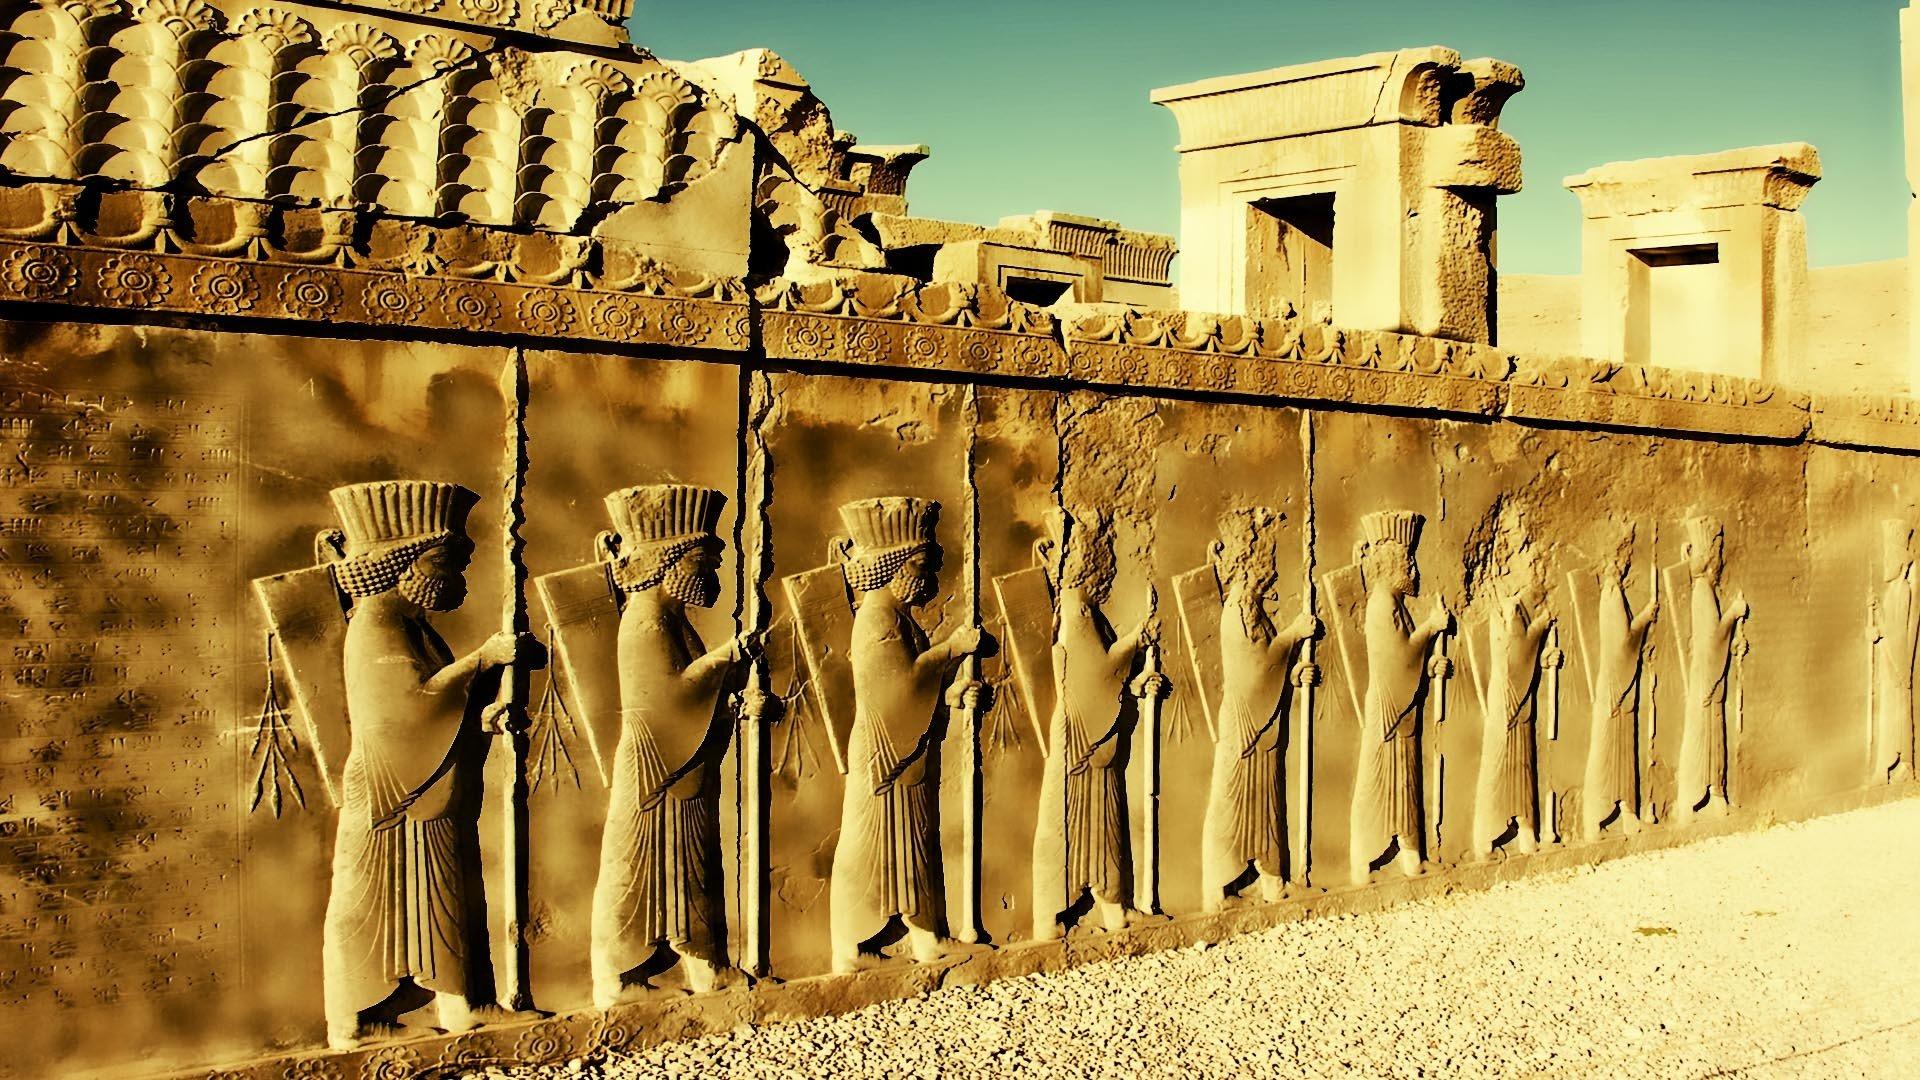 Iran Shiraz Persepolis Hd Wallpapers Desktop And Mobile Images Photos